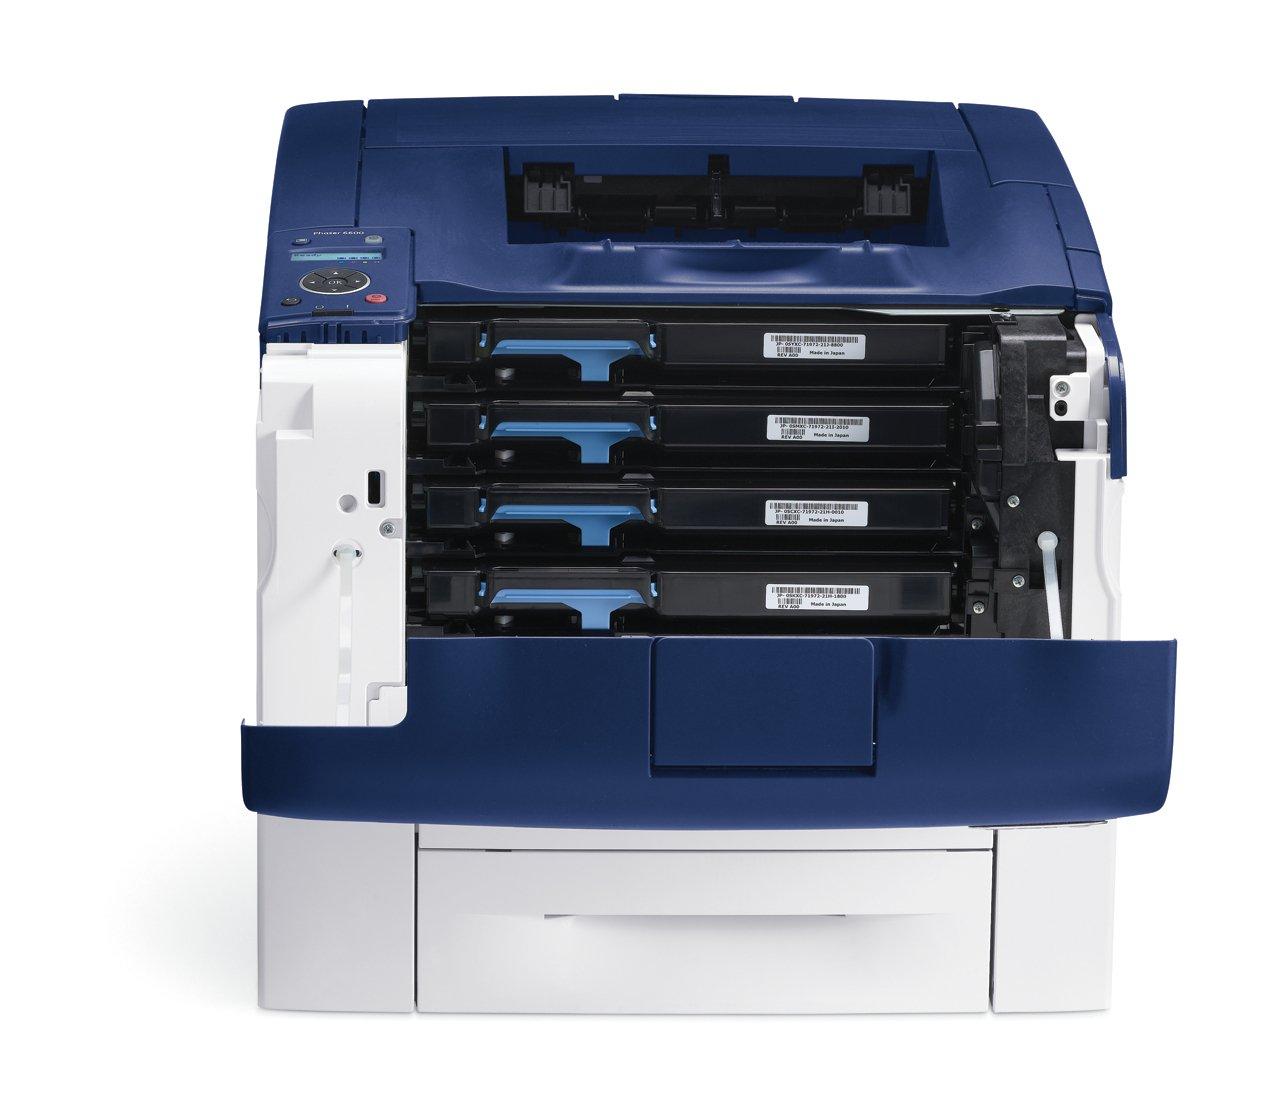 Color printing austin - Color Printing Austin 74